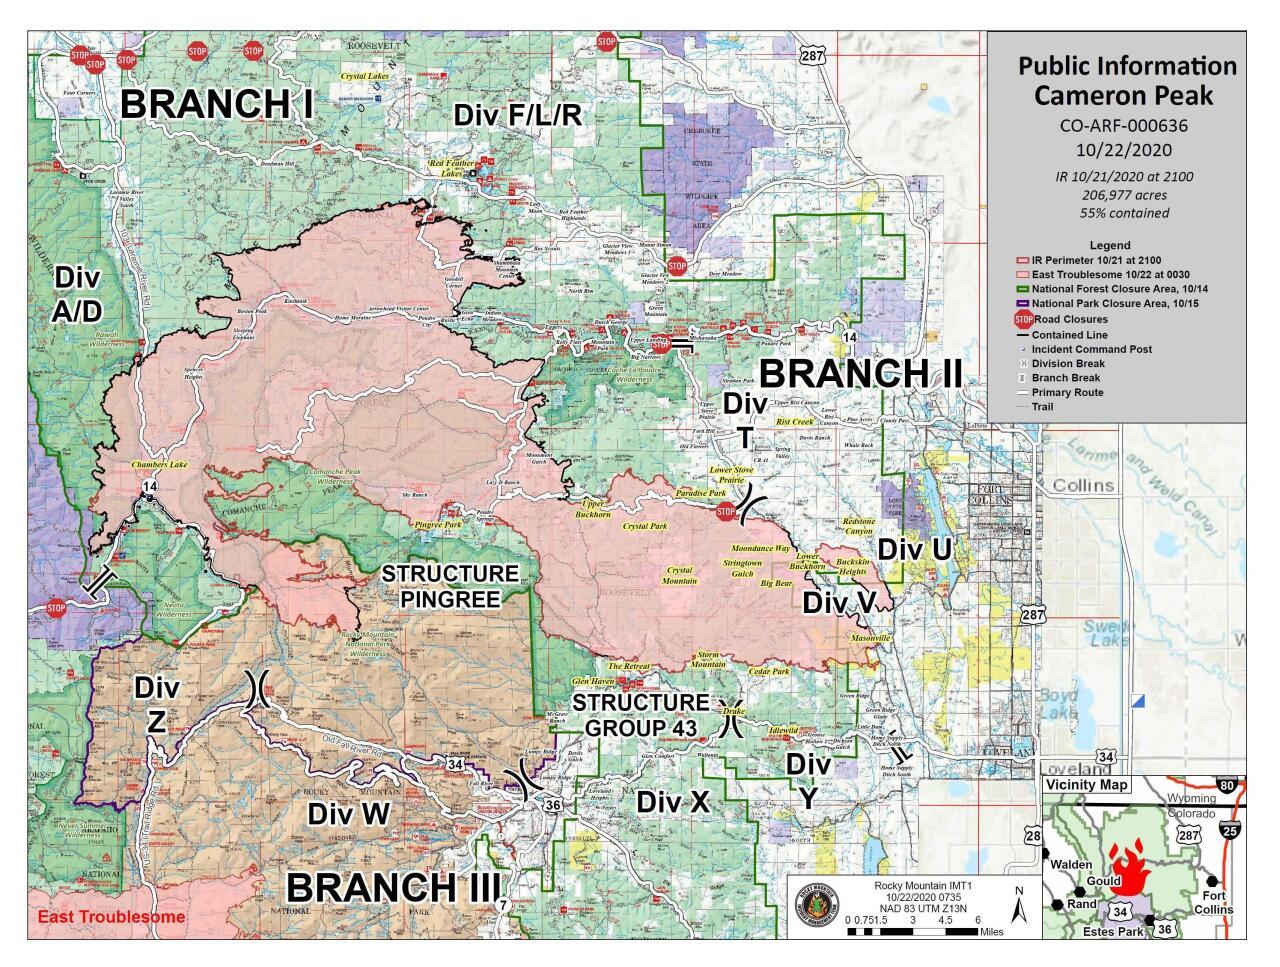 Cameron Peak Fire map_Oct 22 2020